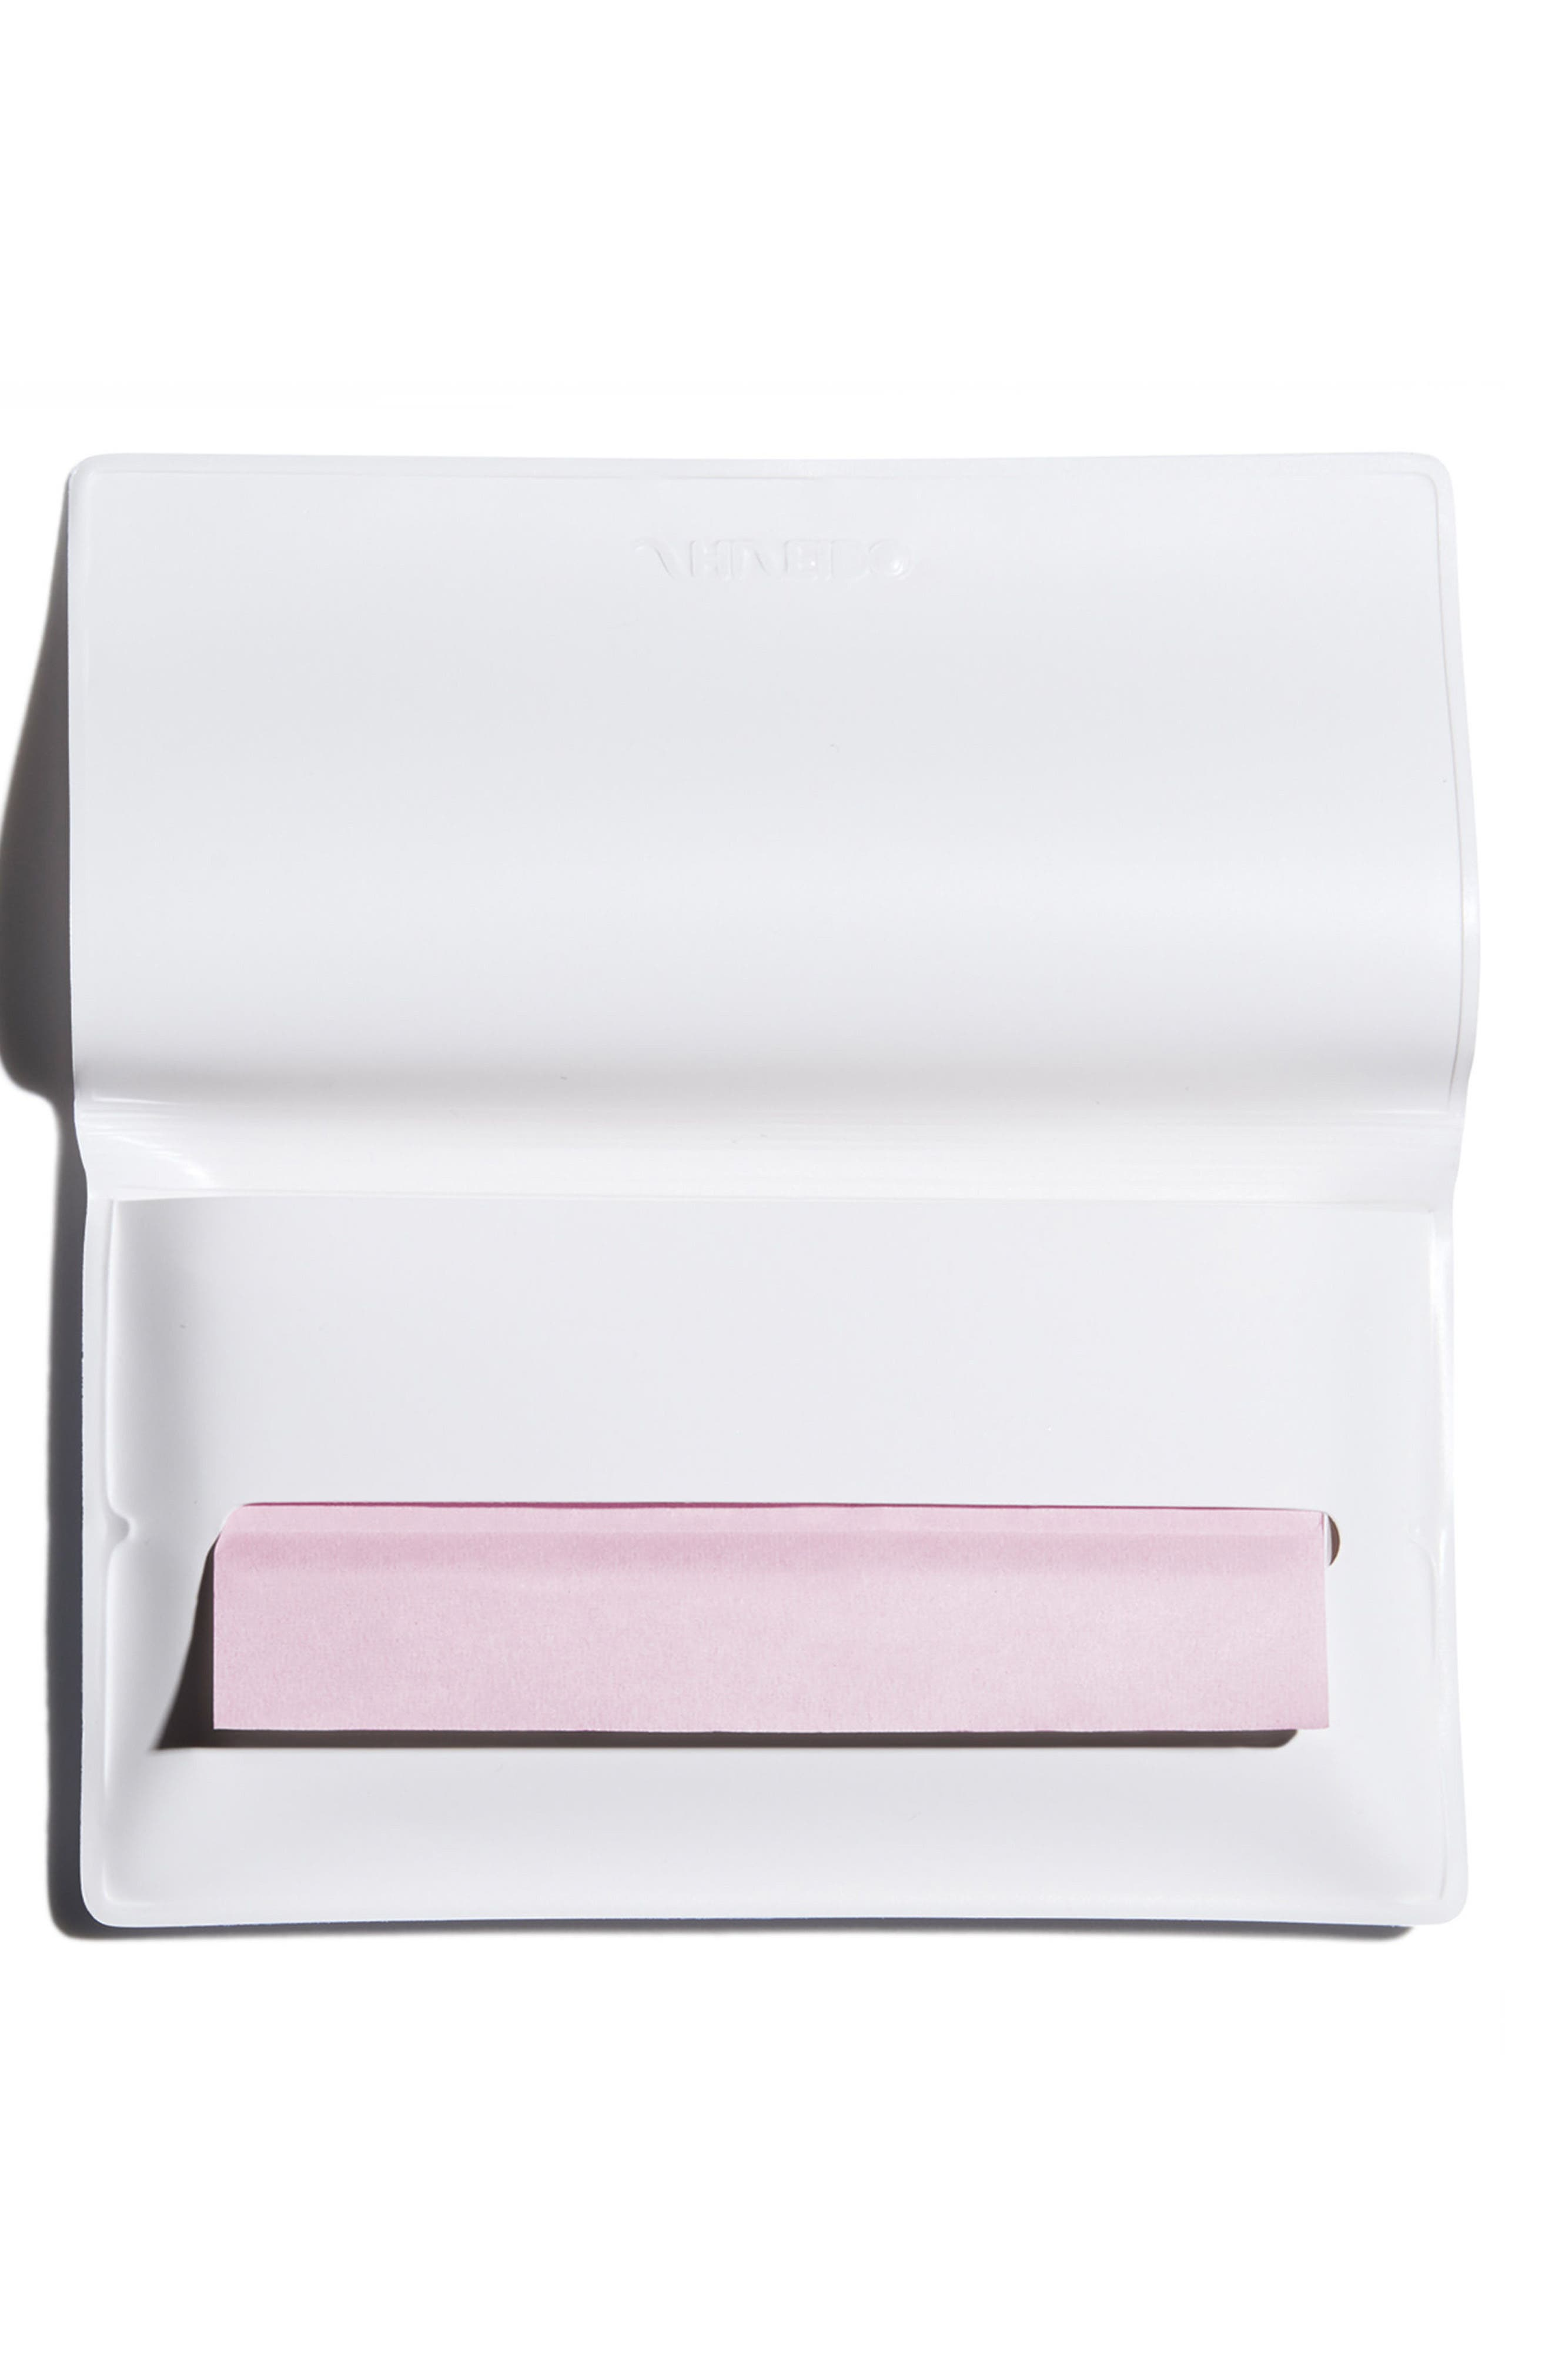 Alternate Image 1 Selected - Shiseido Oil-Control Blotting Paper